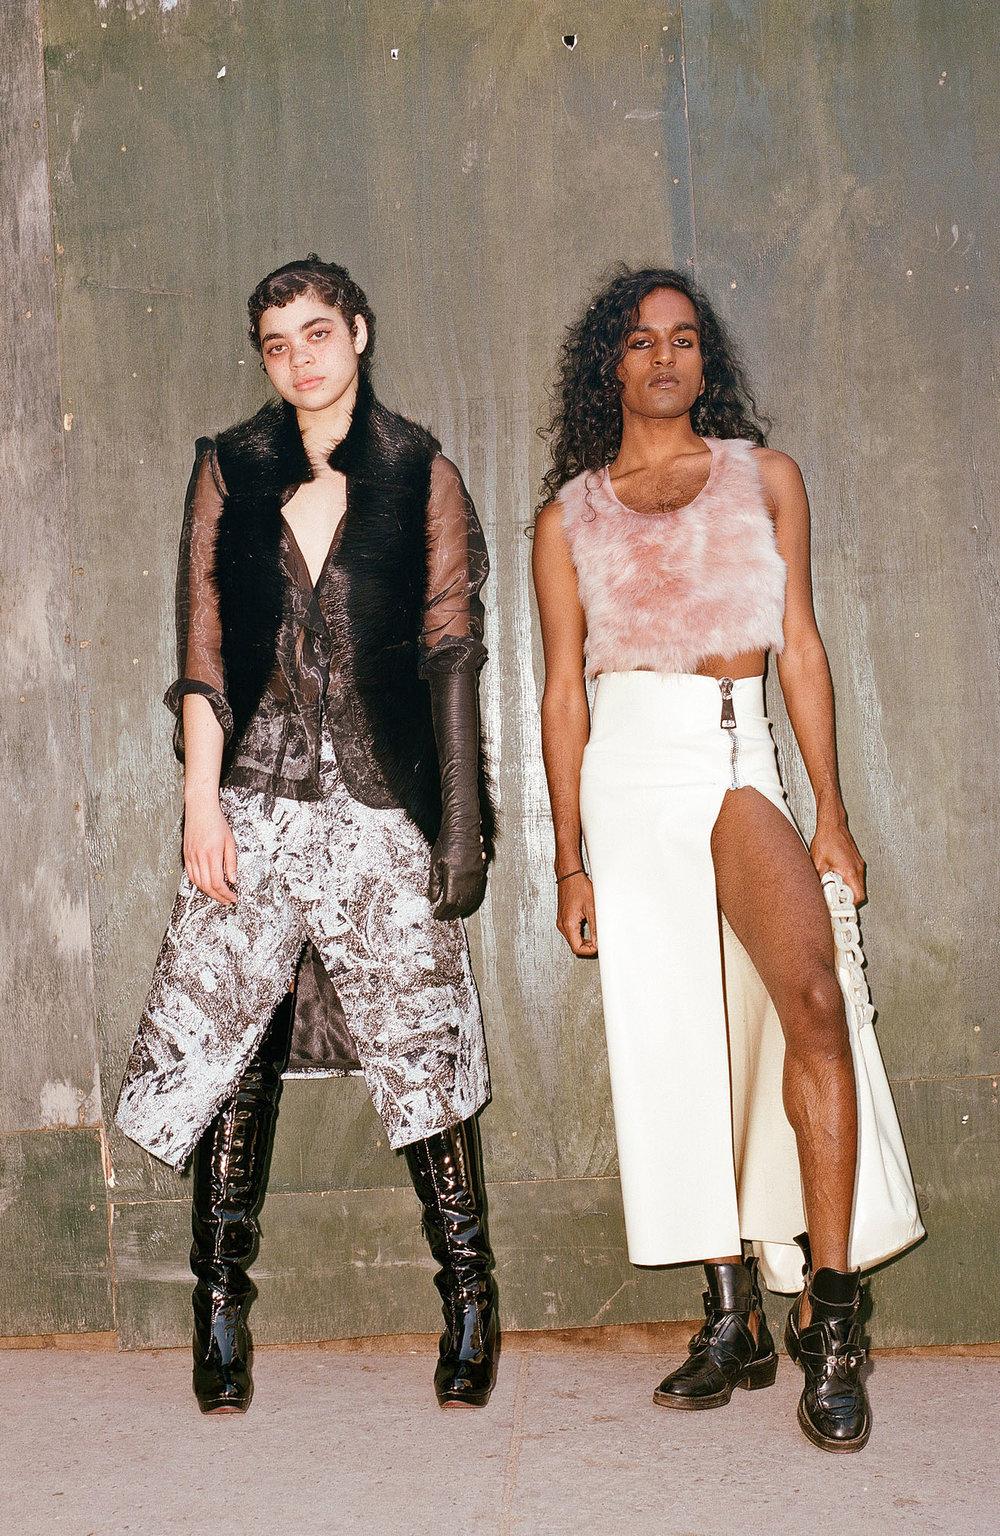 http://fashionista.com/2017/02/nyfw-new-designers-fall-2017 #FASHIONISTA